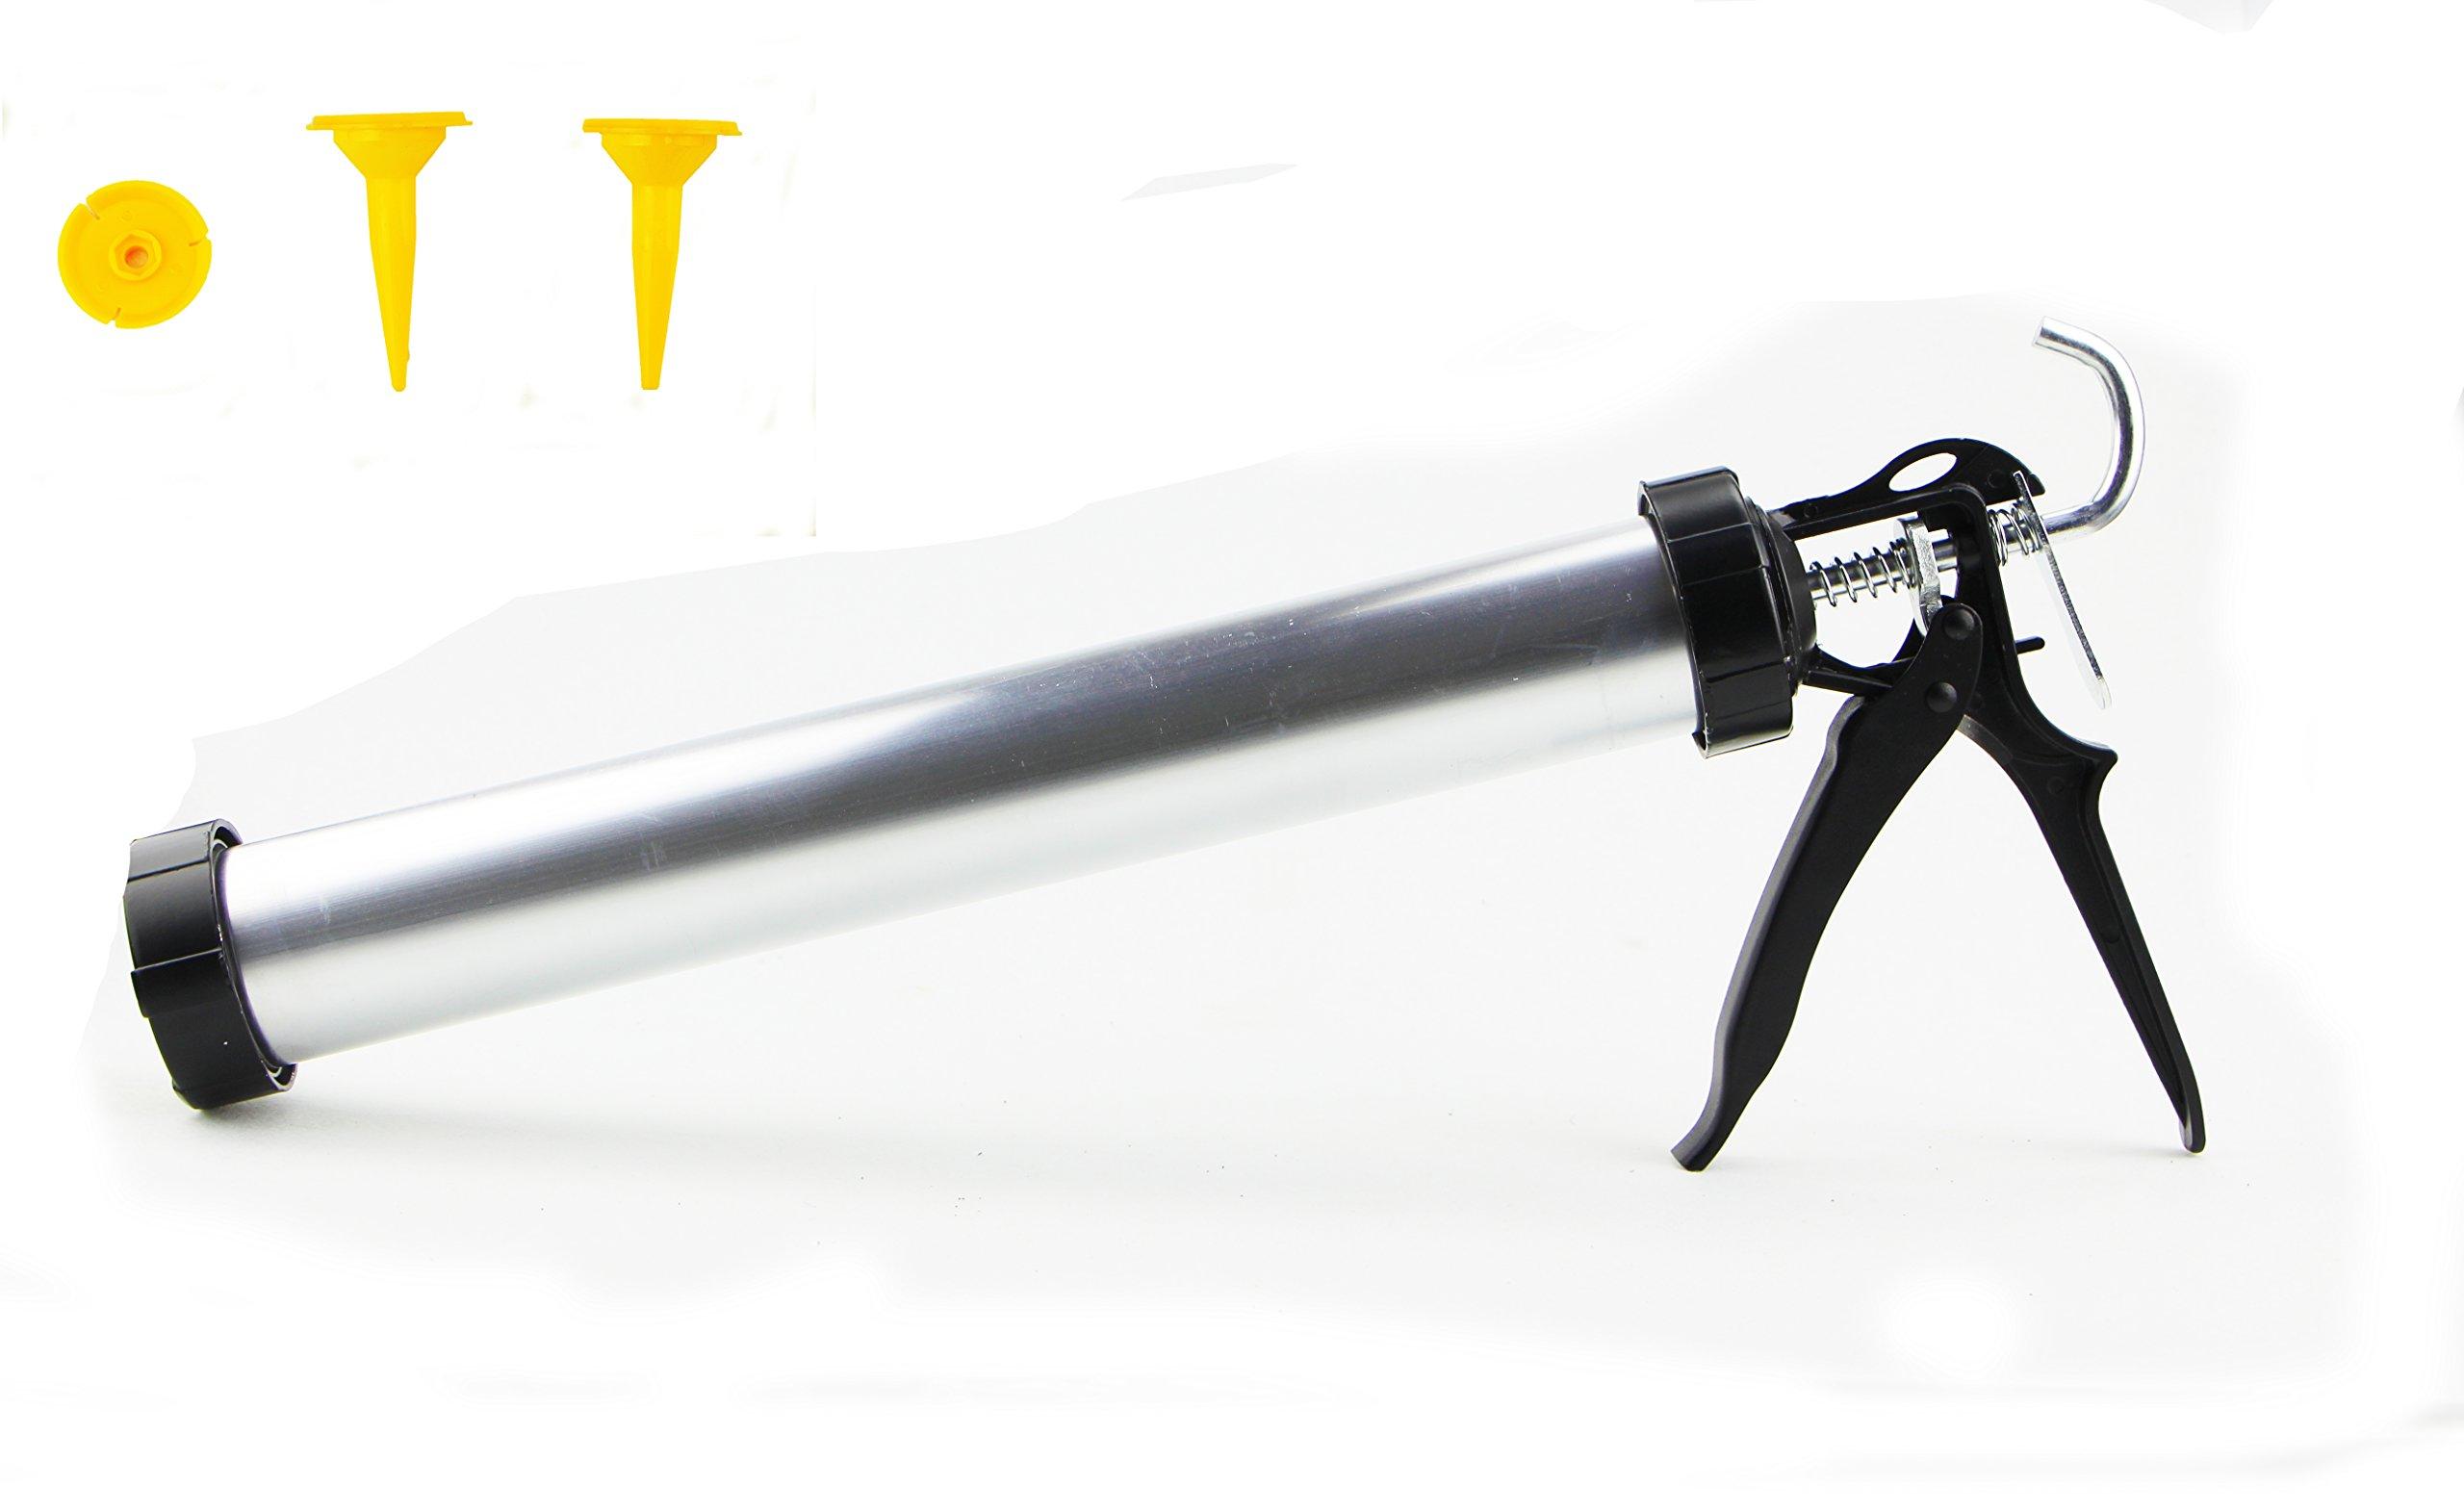 EcBy TECH 23 oz Manual Sausage Pack Caulking Gun,Caulking Gun with Aluminum Barrel,390mm 600ml Sausage rubber,24:1 Thrust Ratio for Decoration,Hardware Tools [Silver&Black]